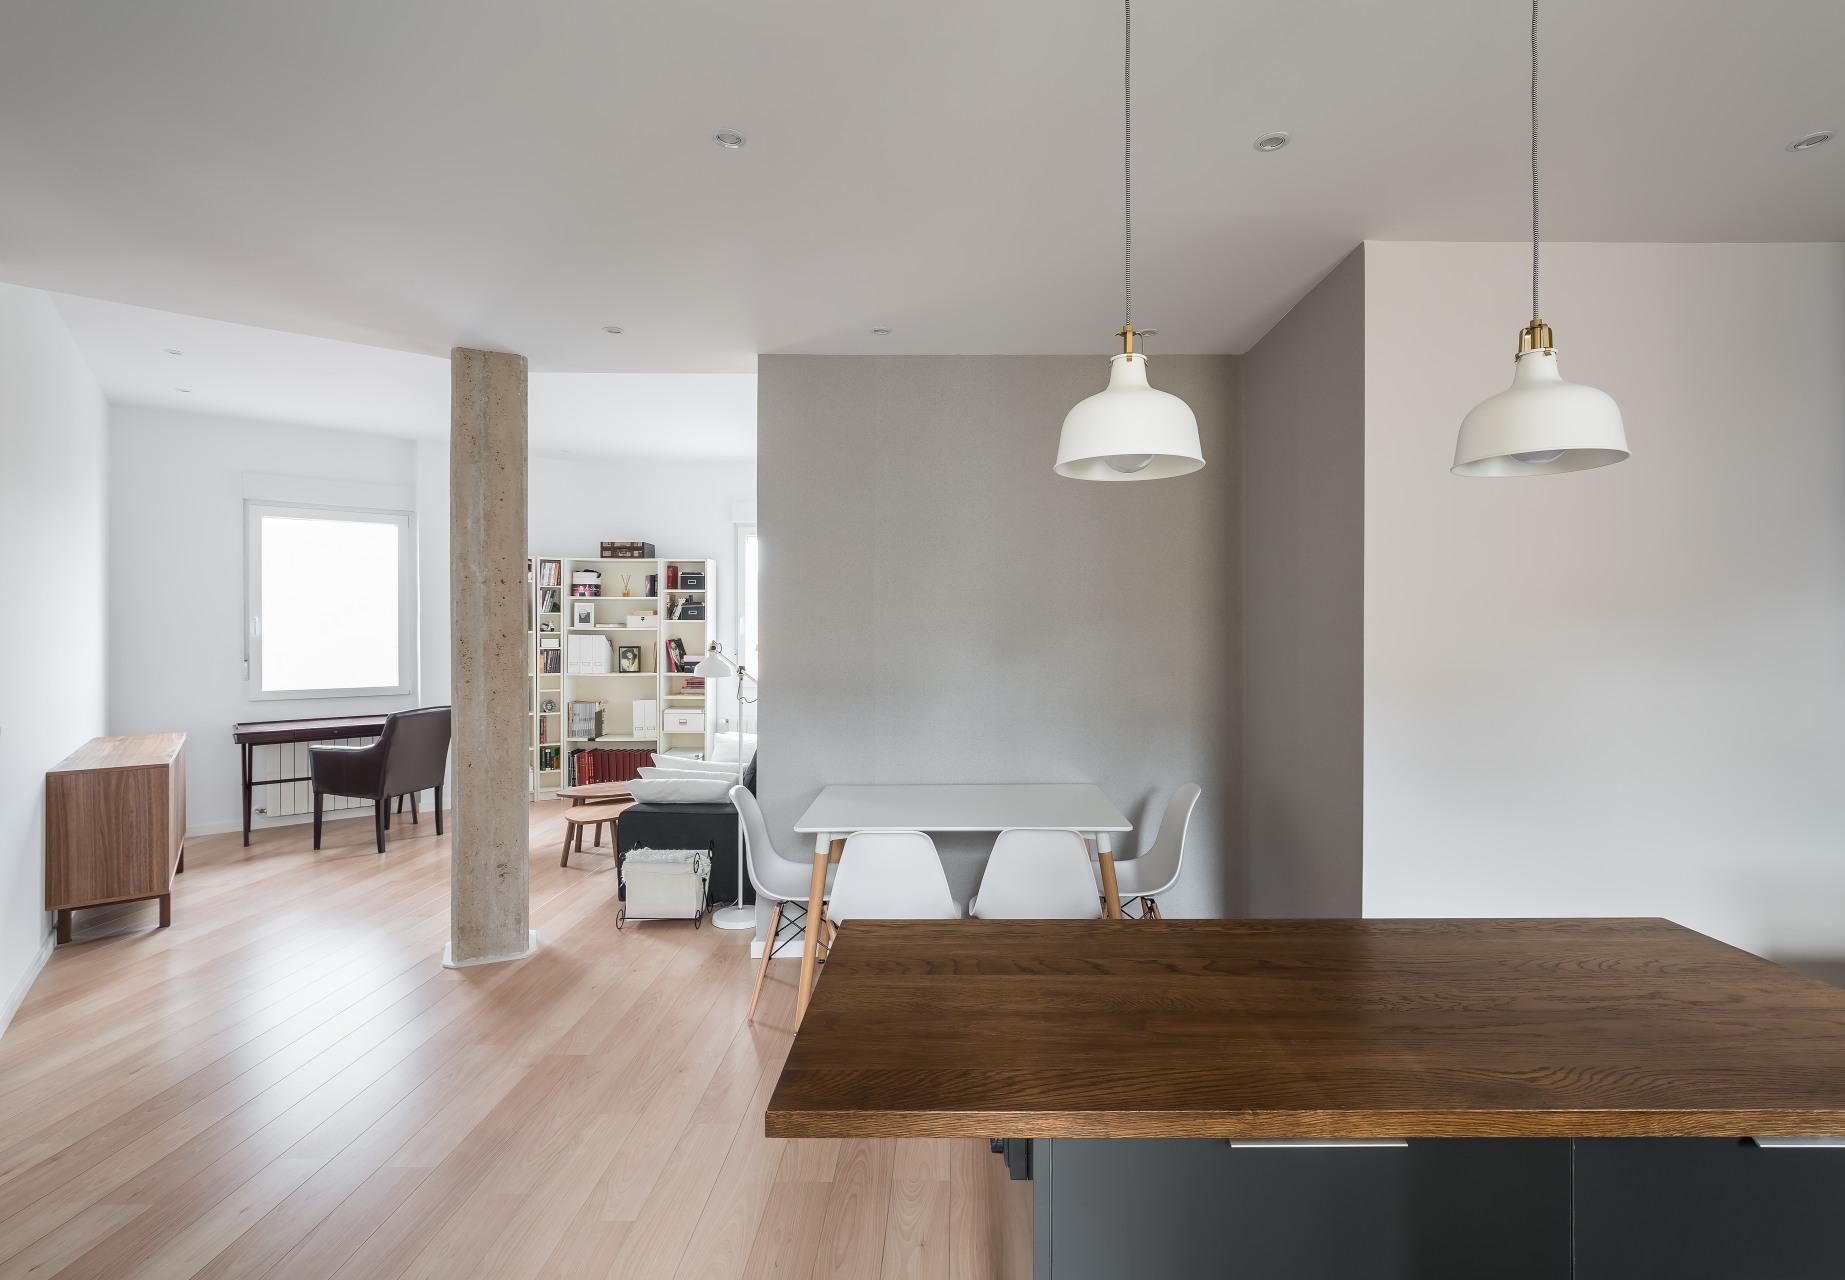 fotografia-arquitectura-interiorismo-valencia-german-cabo-lliberos-alboraya (2)